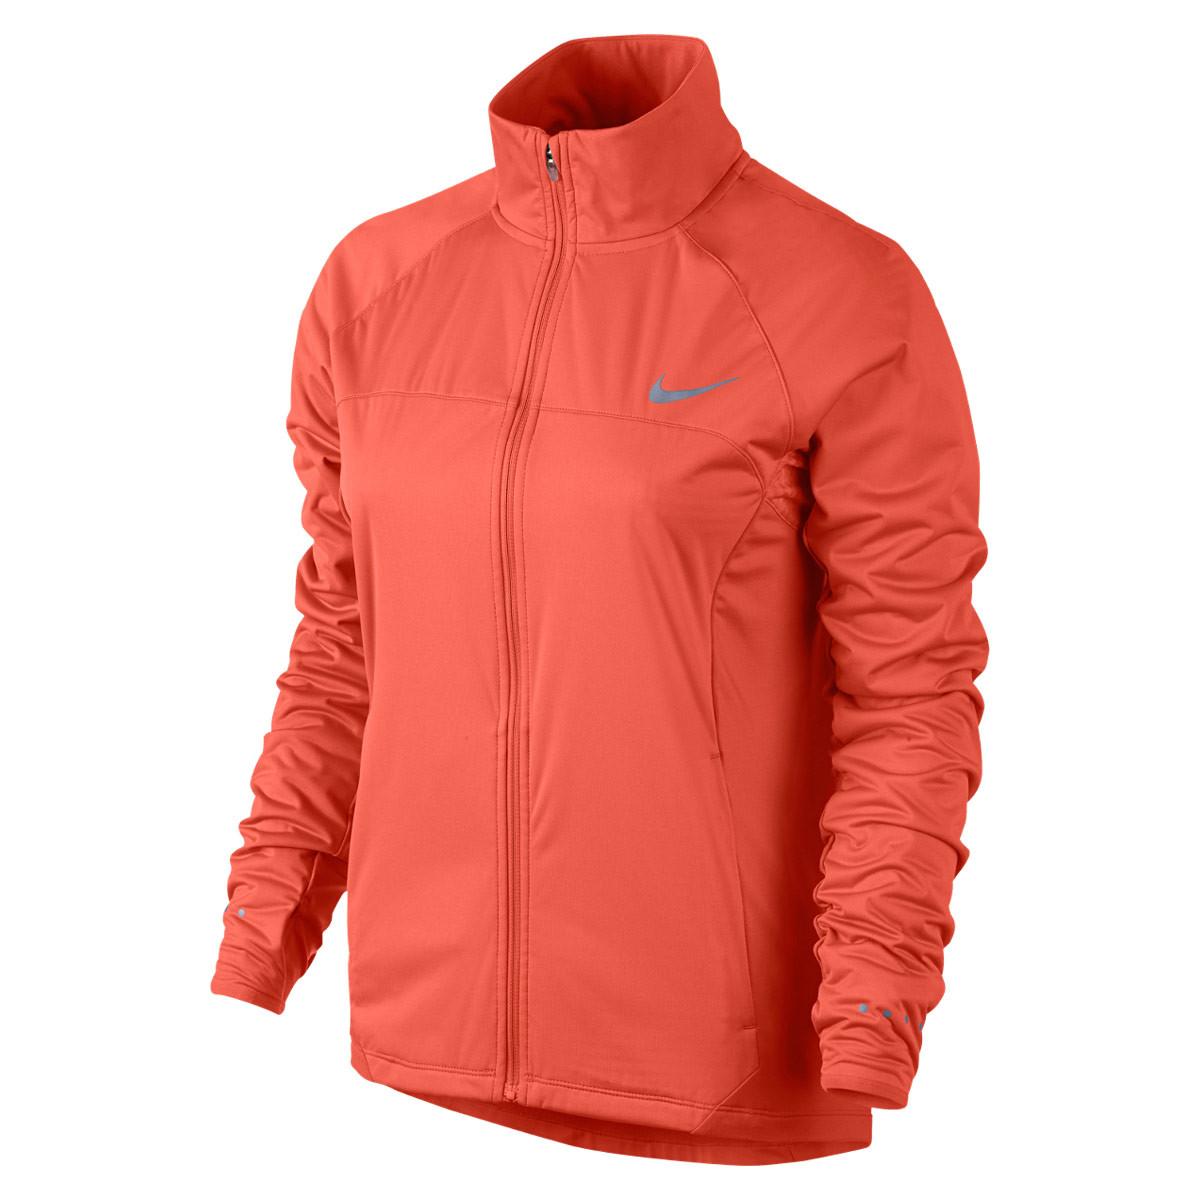 1722e4e791ea Nike Shield Running Jacket - Sweatshirts   Hoodies for Women - Red ...